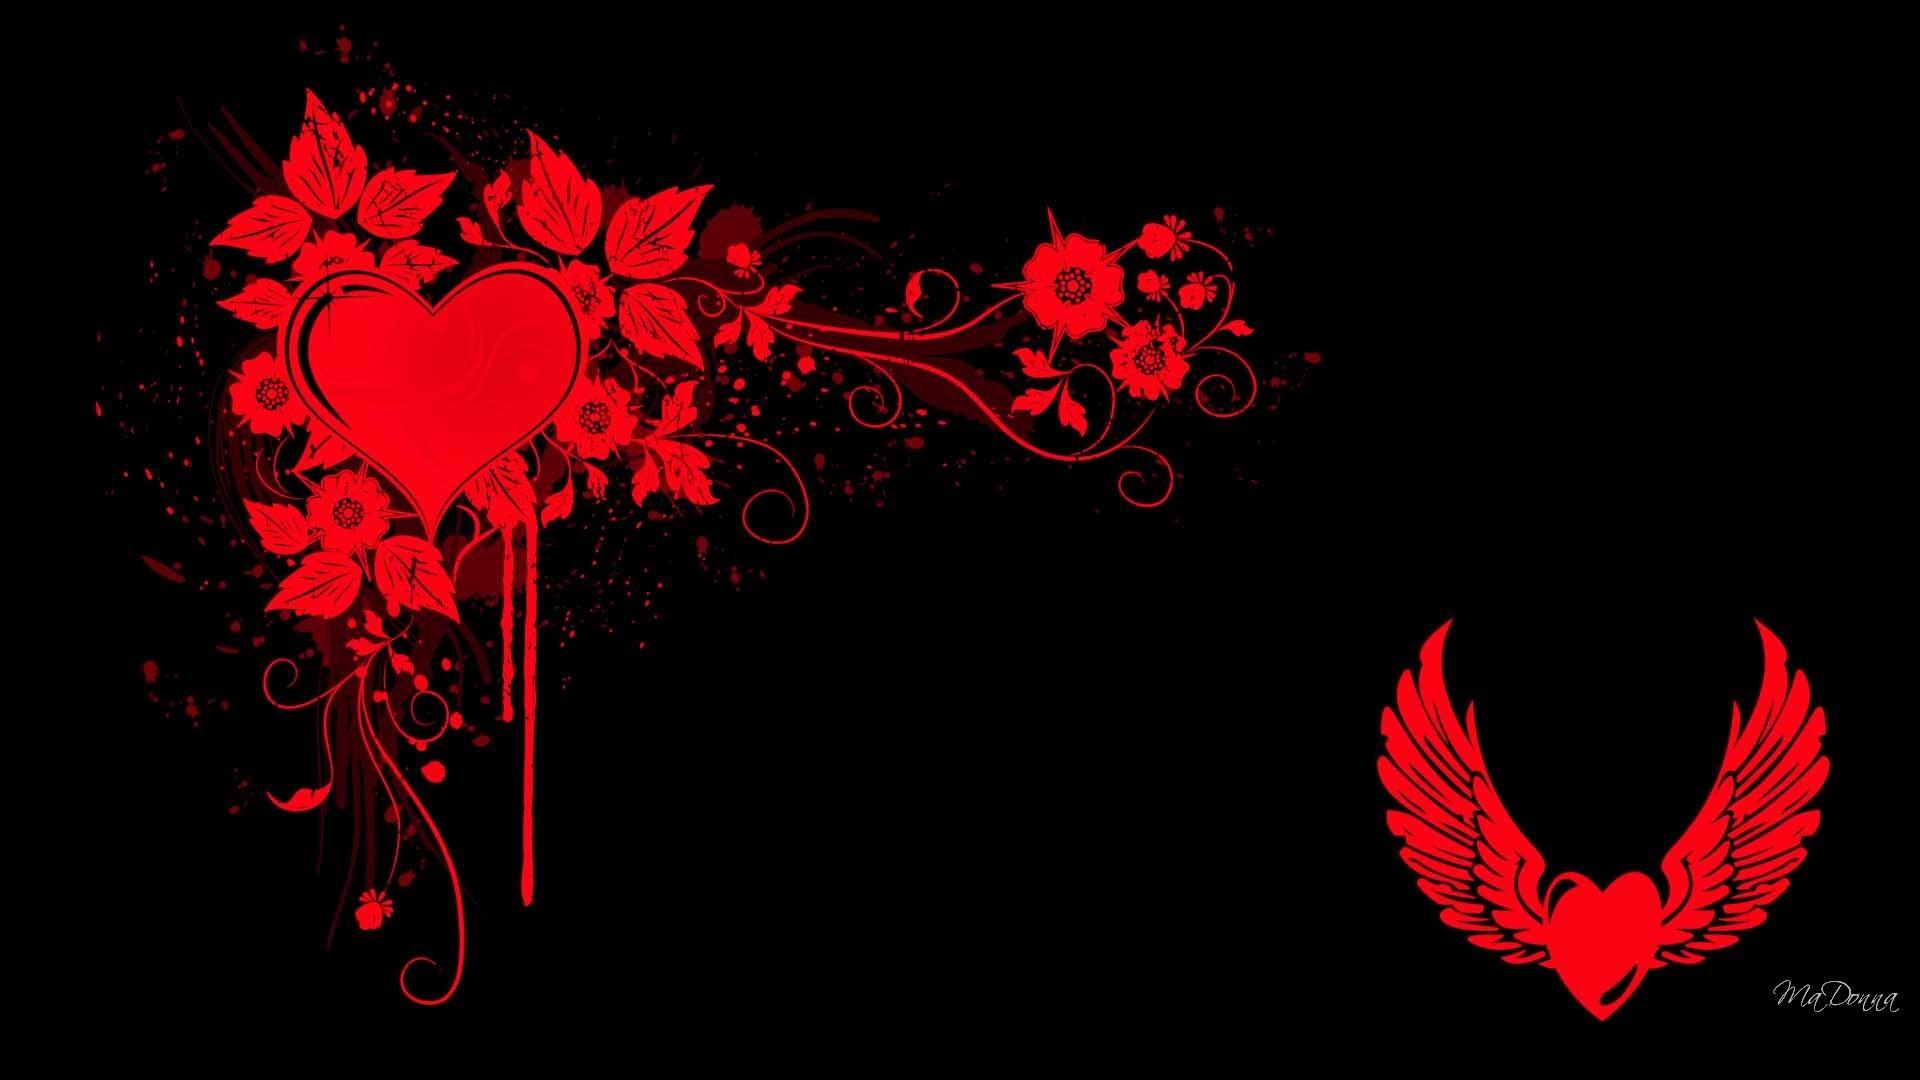 Heartbreak Wallpapers With Quotes In Hindi Heartbroken Wallpaper 64 Images